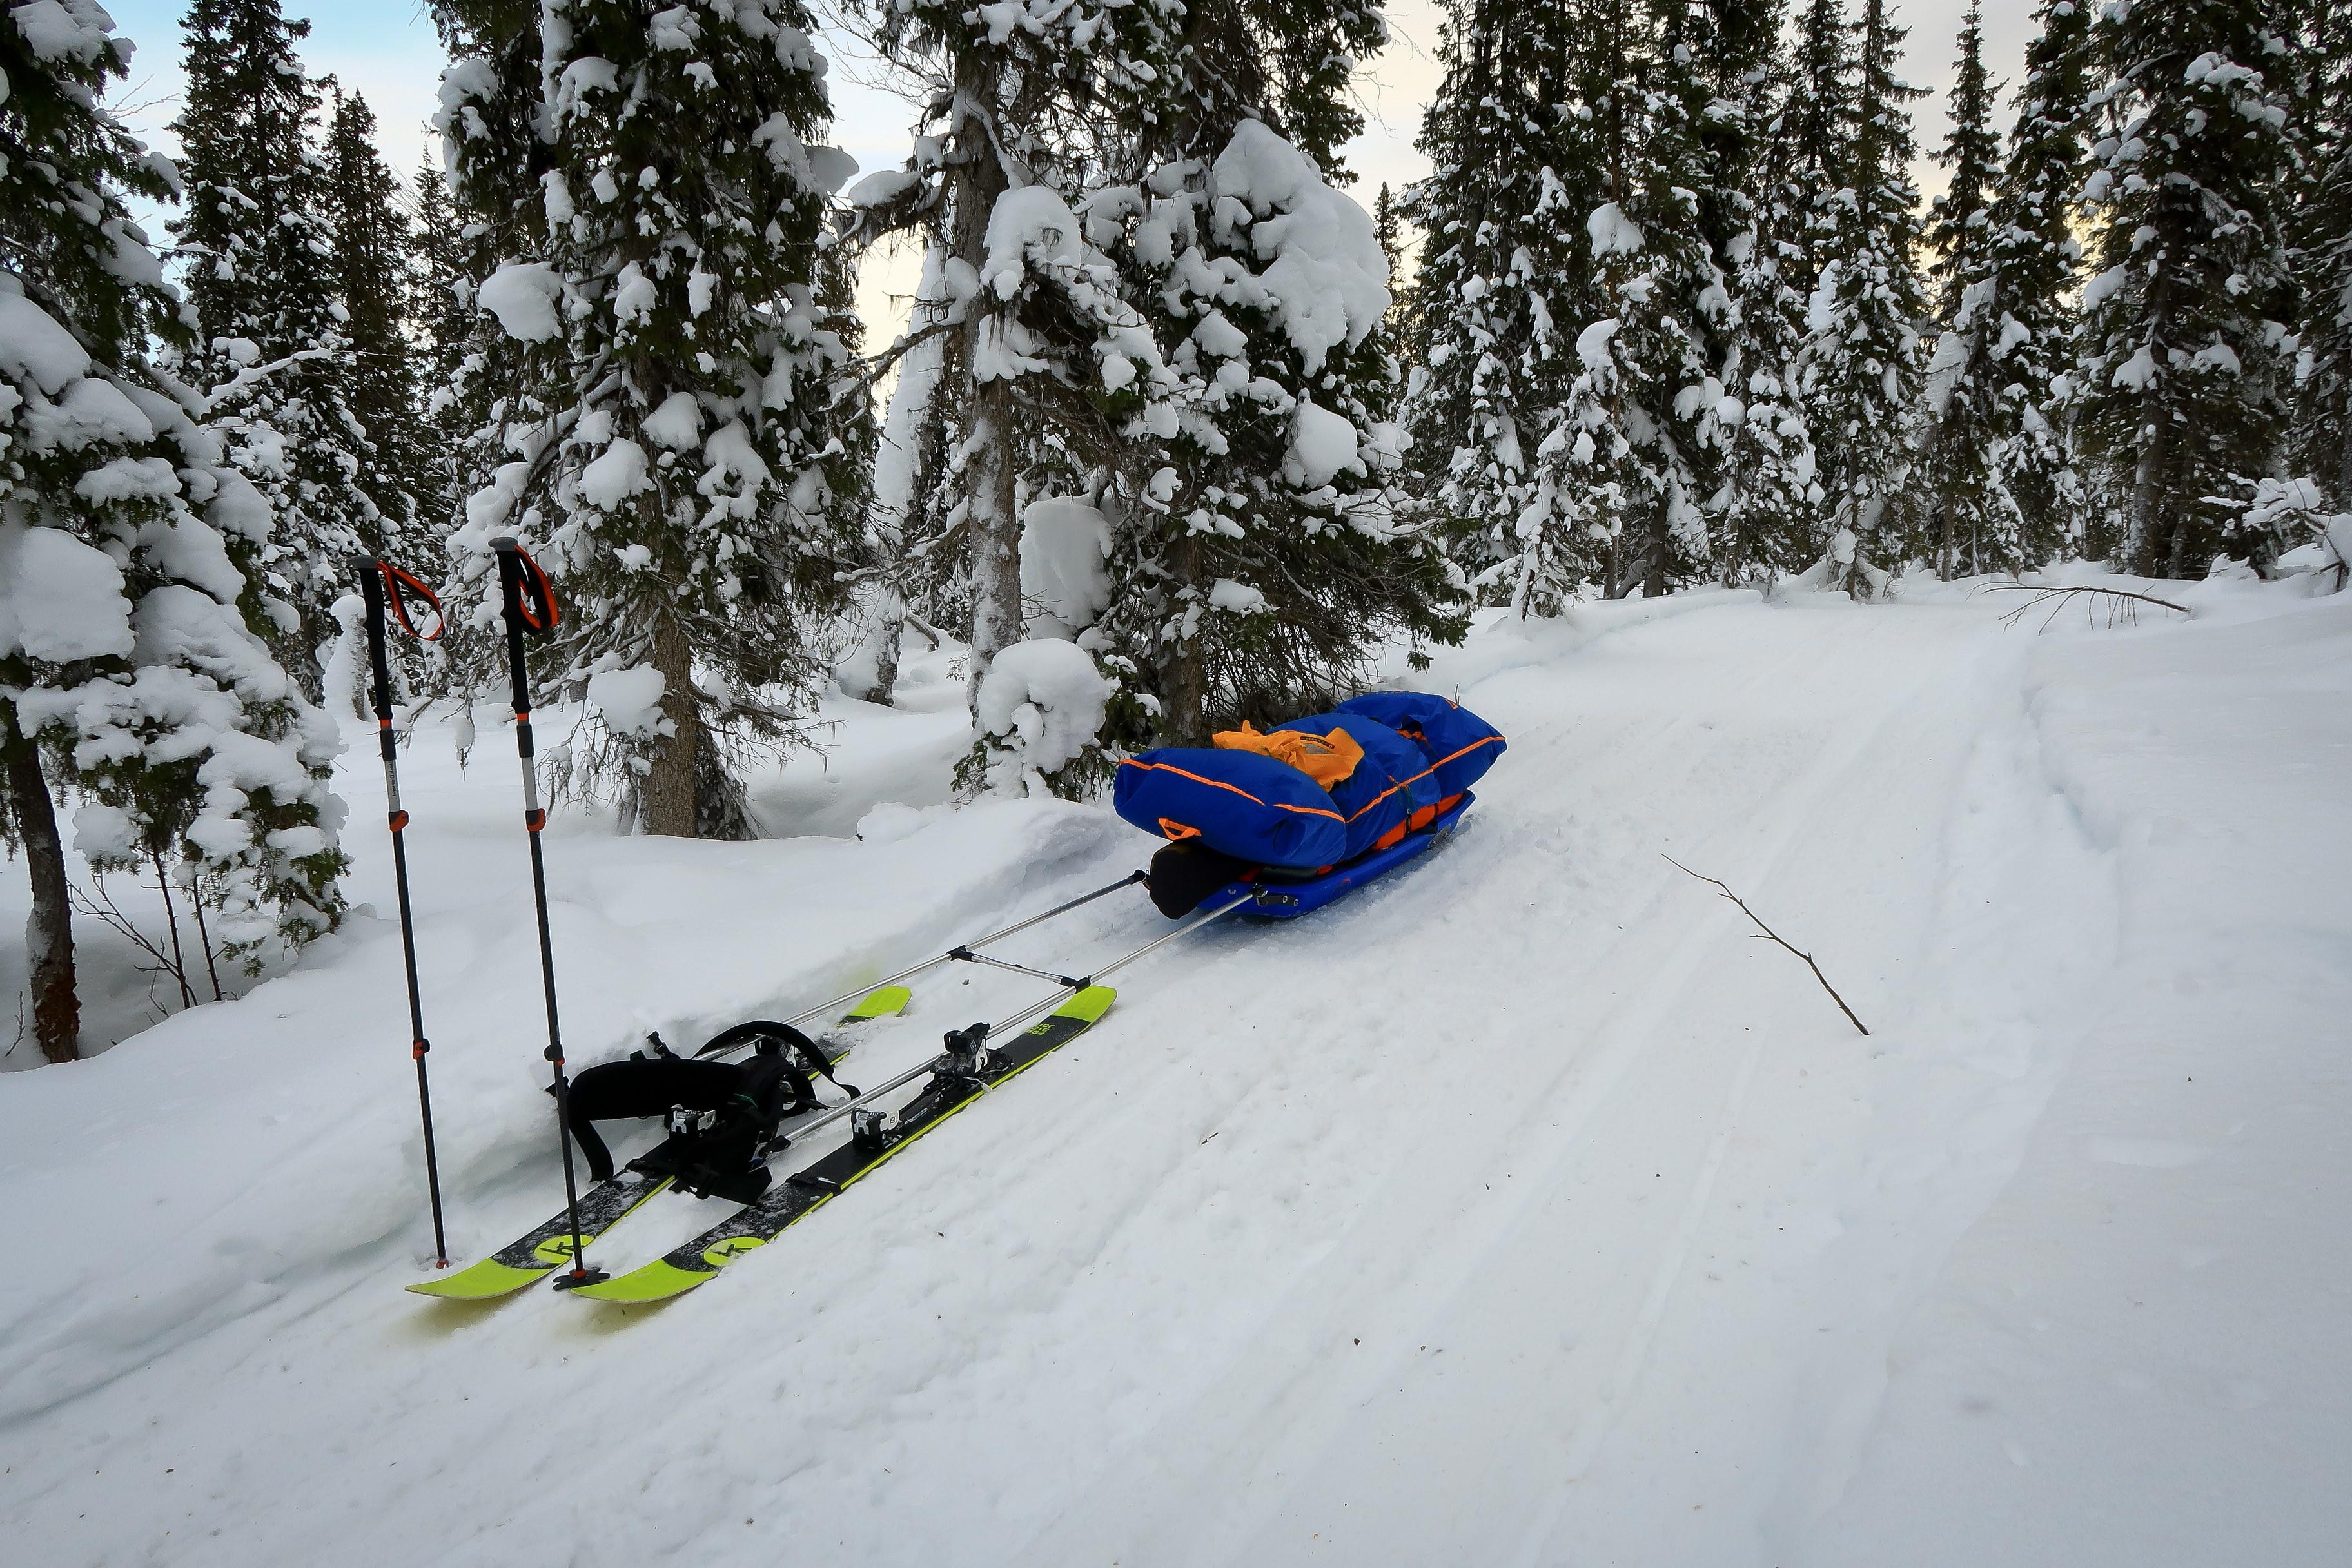 Big blue pulk behind some unsuitable skis